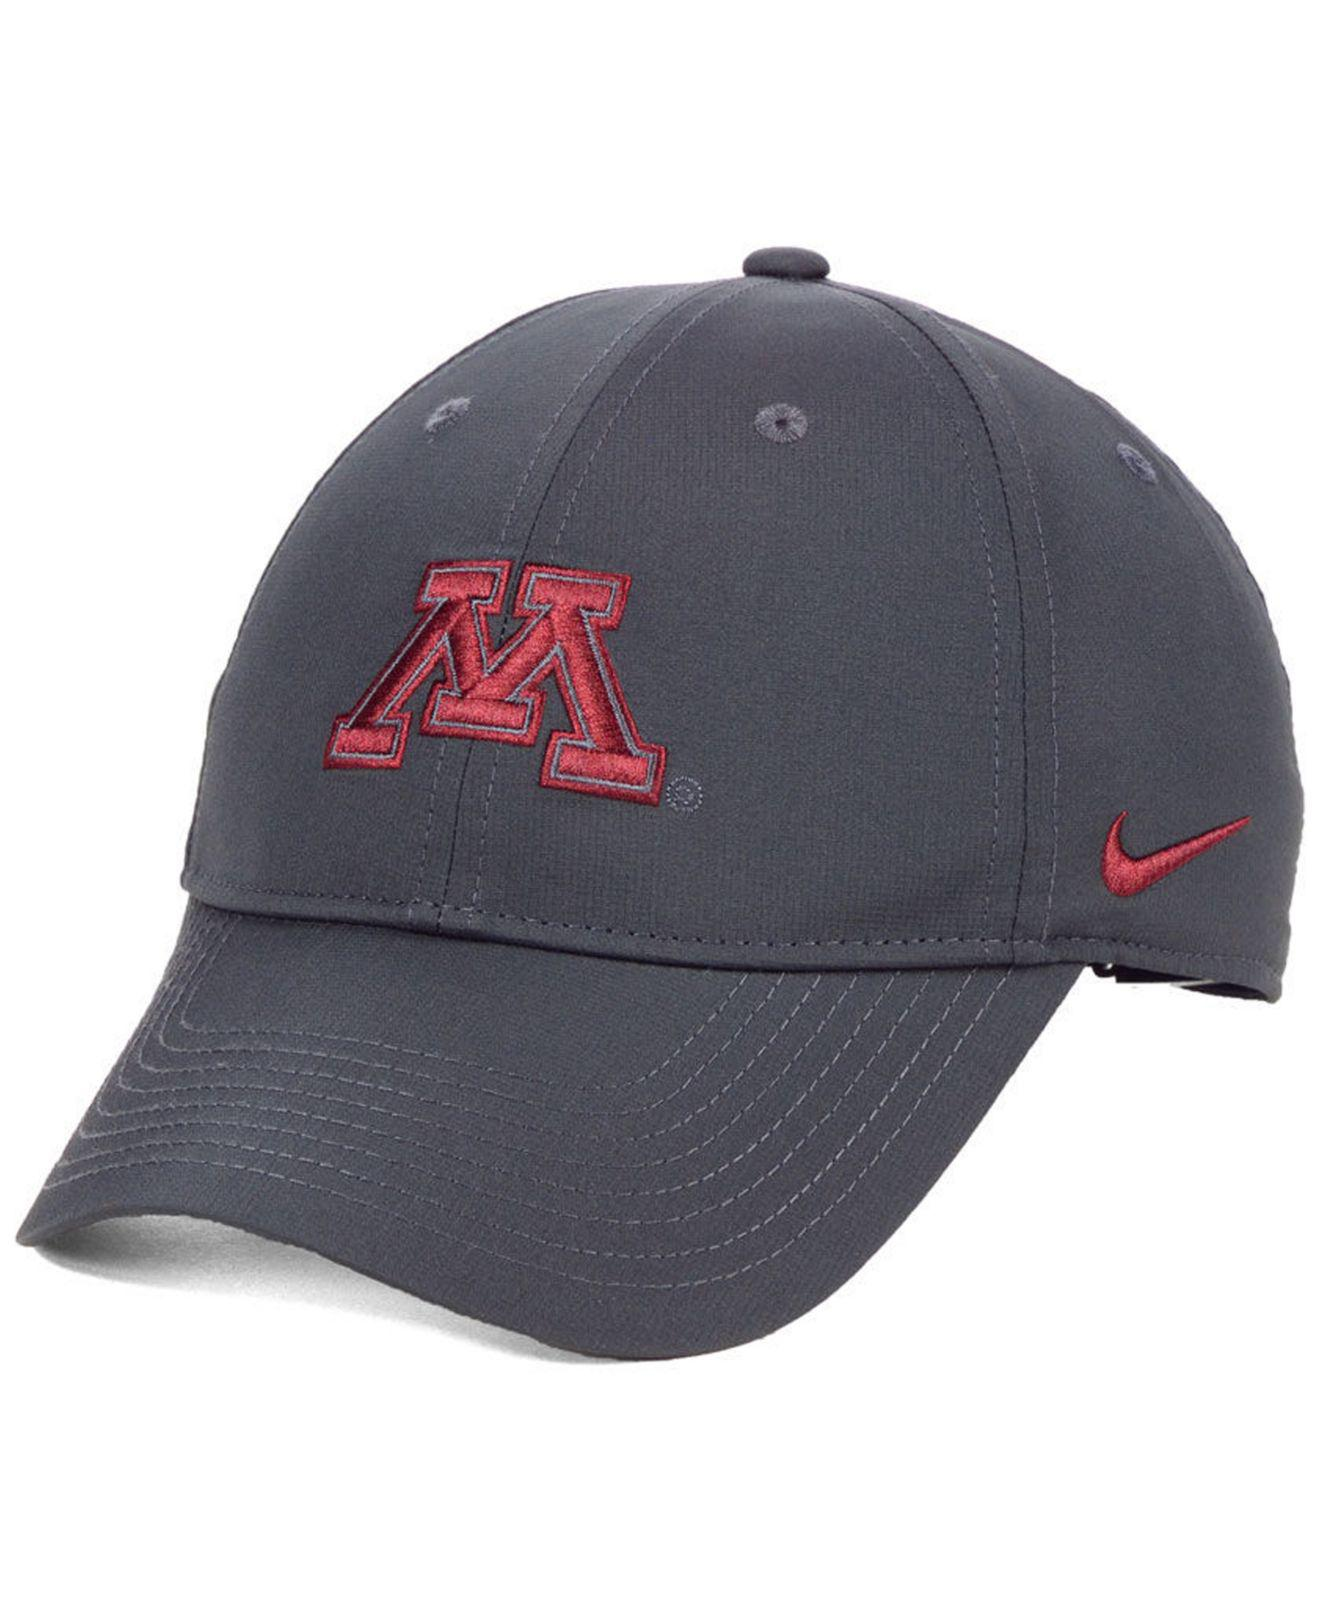 ad8d4aa163b Lyst - Nike Minnesota Golden Gophers Dri-fit Adjustable Cap in Gray ...